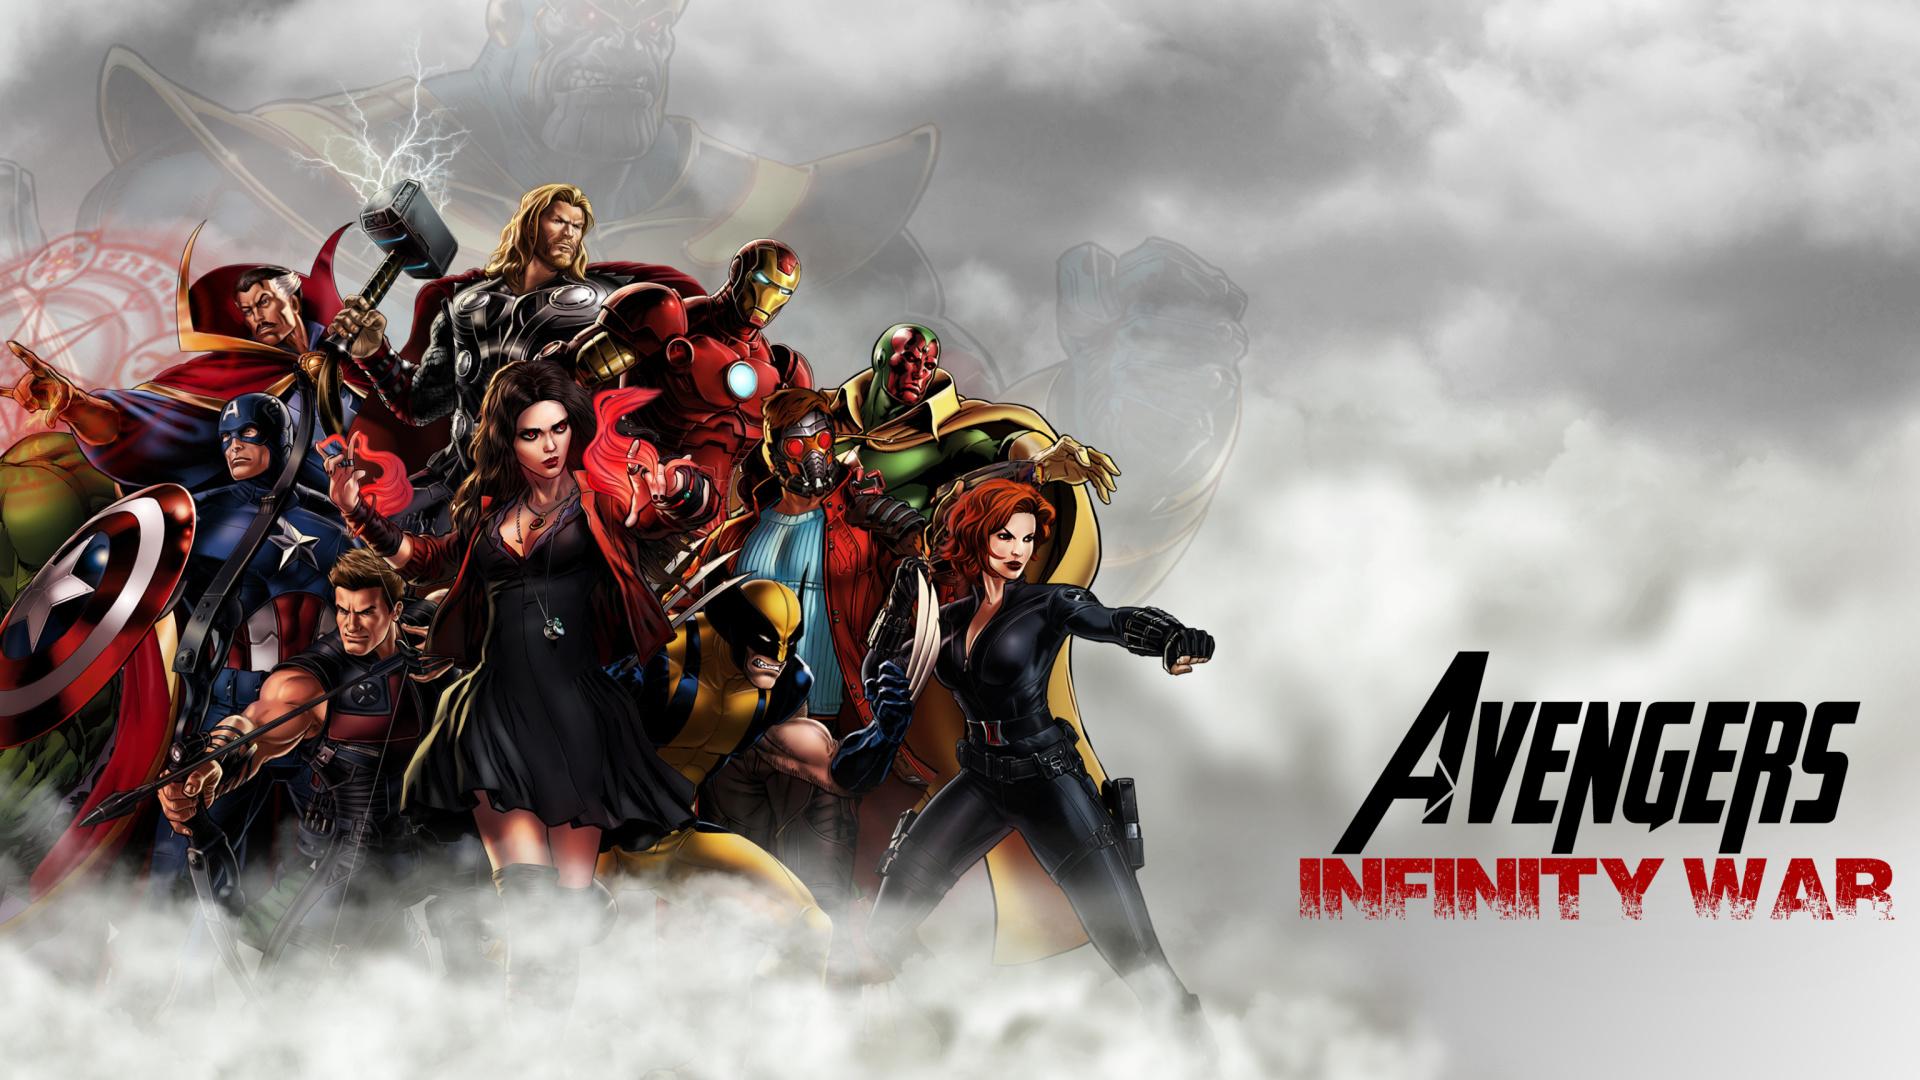 Avengers infinity war 2018 sfondi gratuiti per desktop for Sfondi infinity